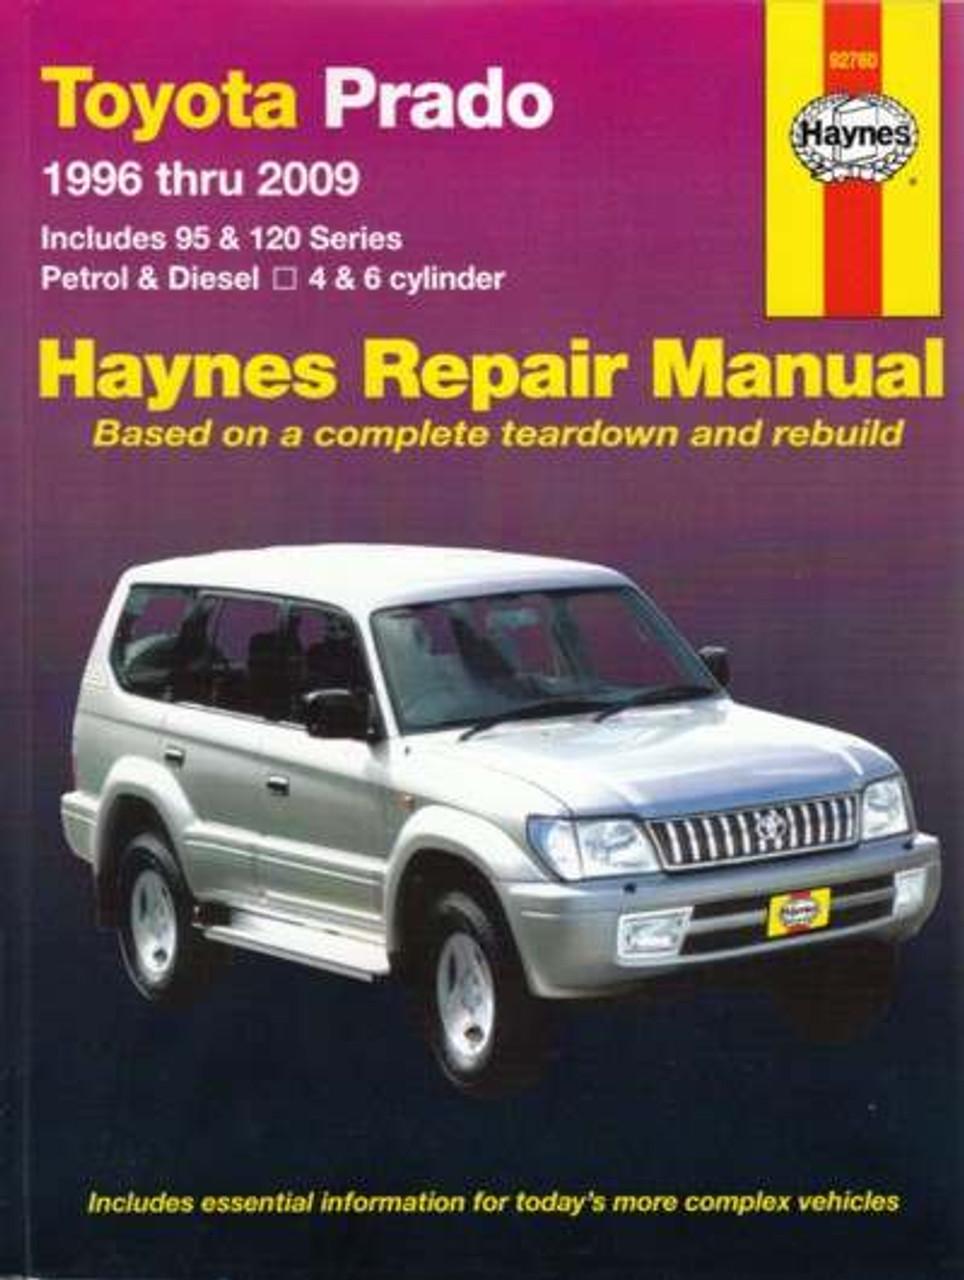 toyota prado 1996 2006 workshop manual rh automotobookshop com au Toyota Camry Manual Toyota Camry Manual